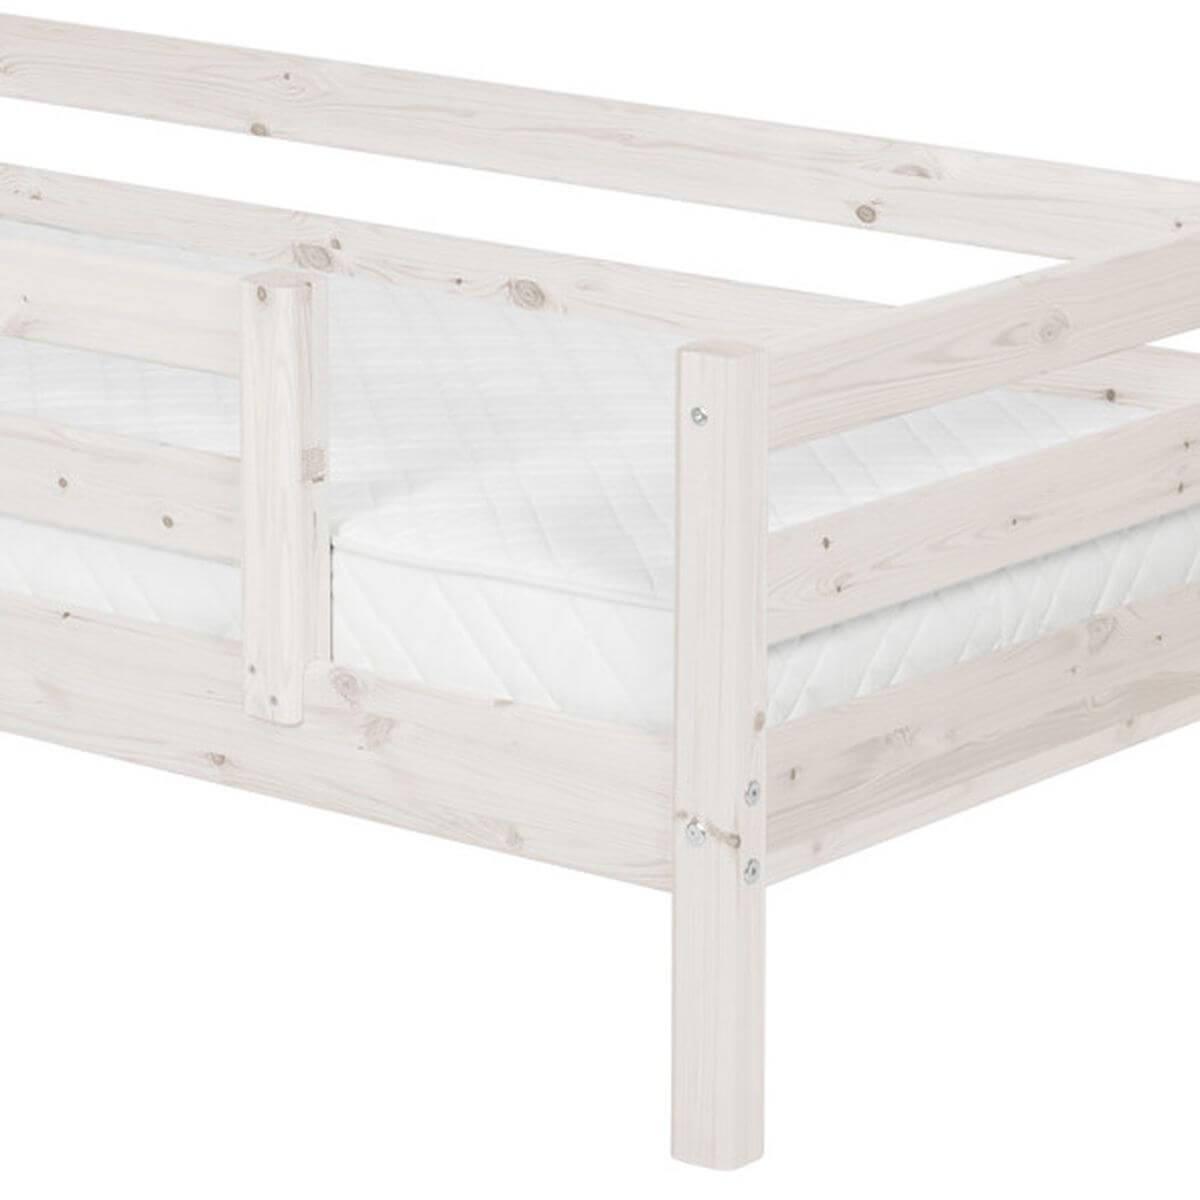 Cama individual barrera 1/2 90x190 CLASSIC Flexa blanco cal